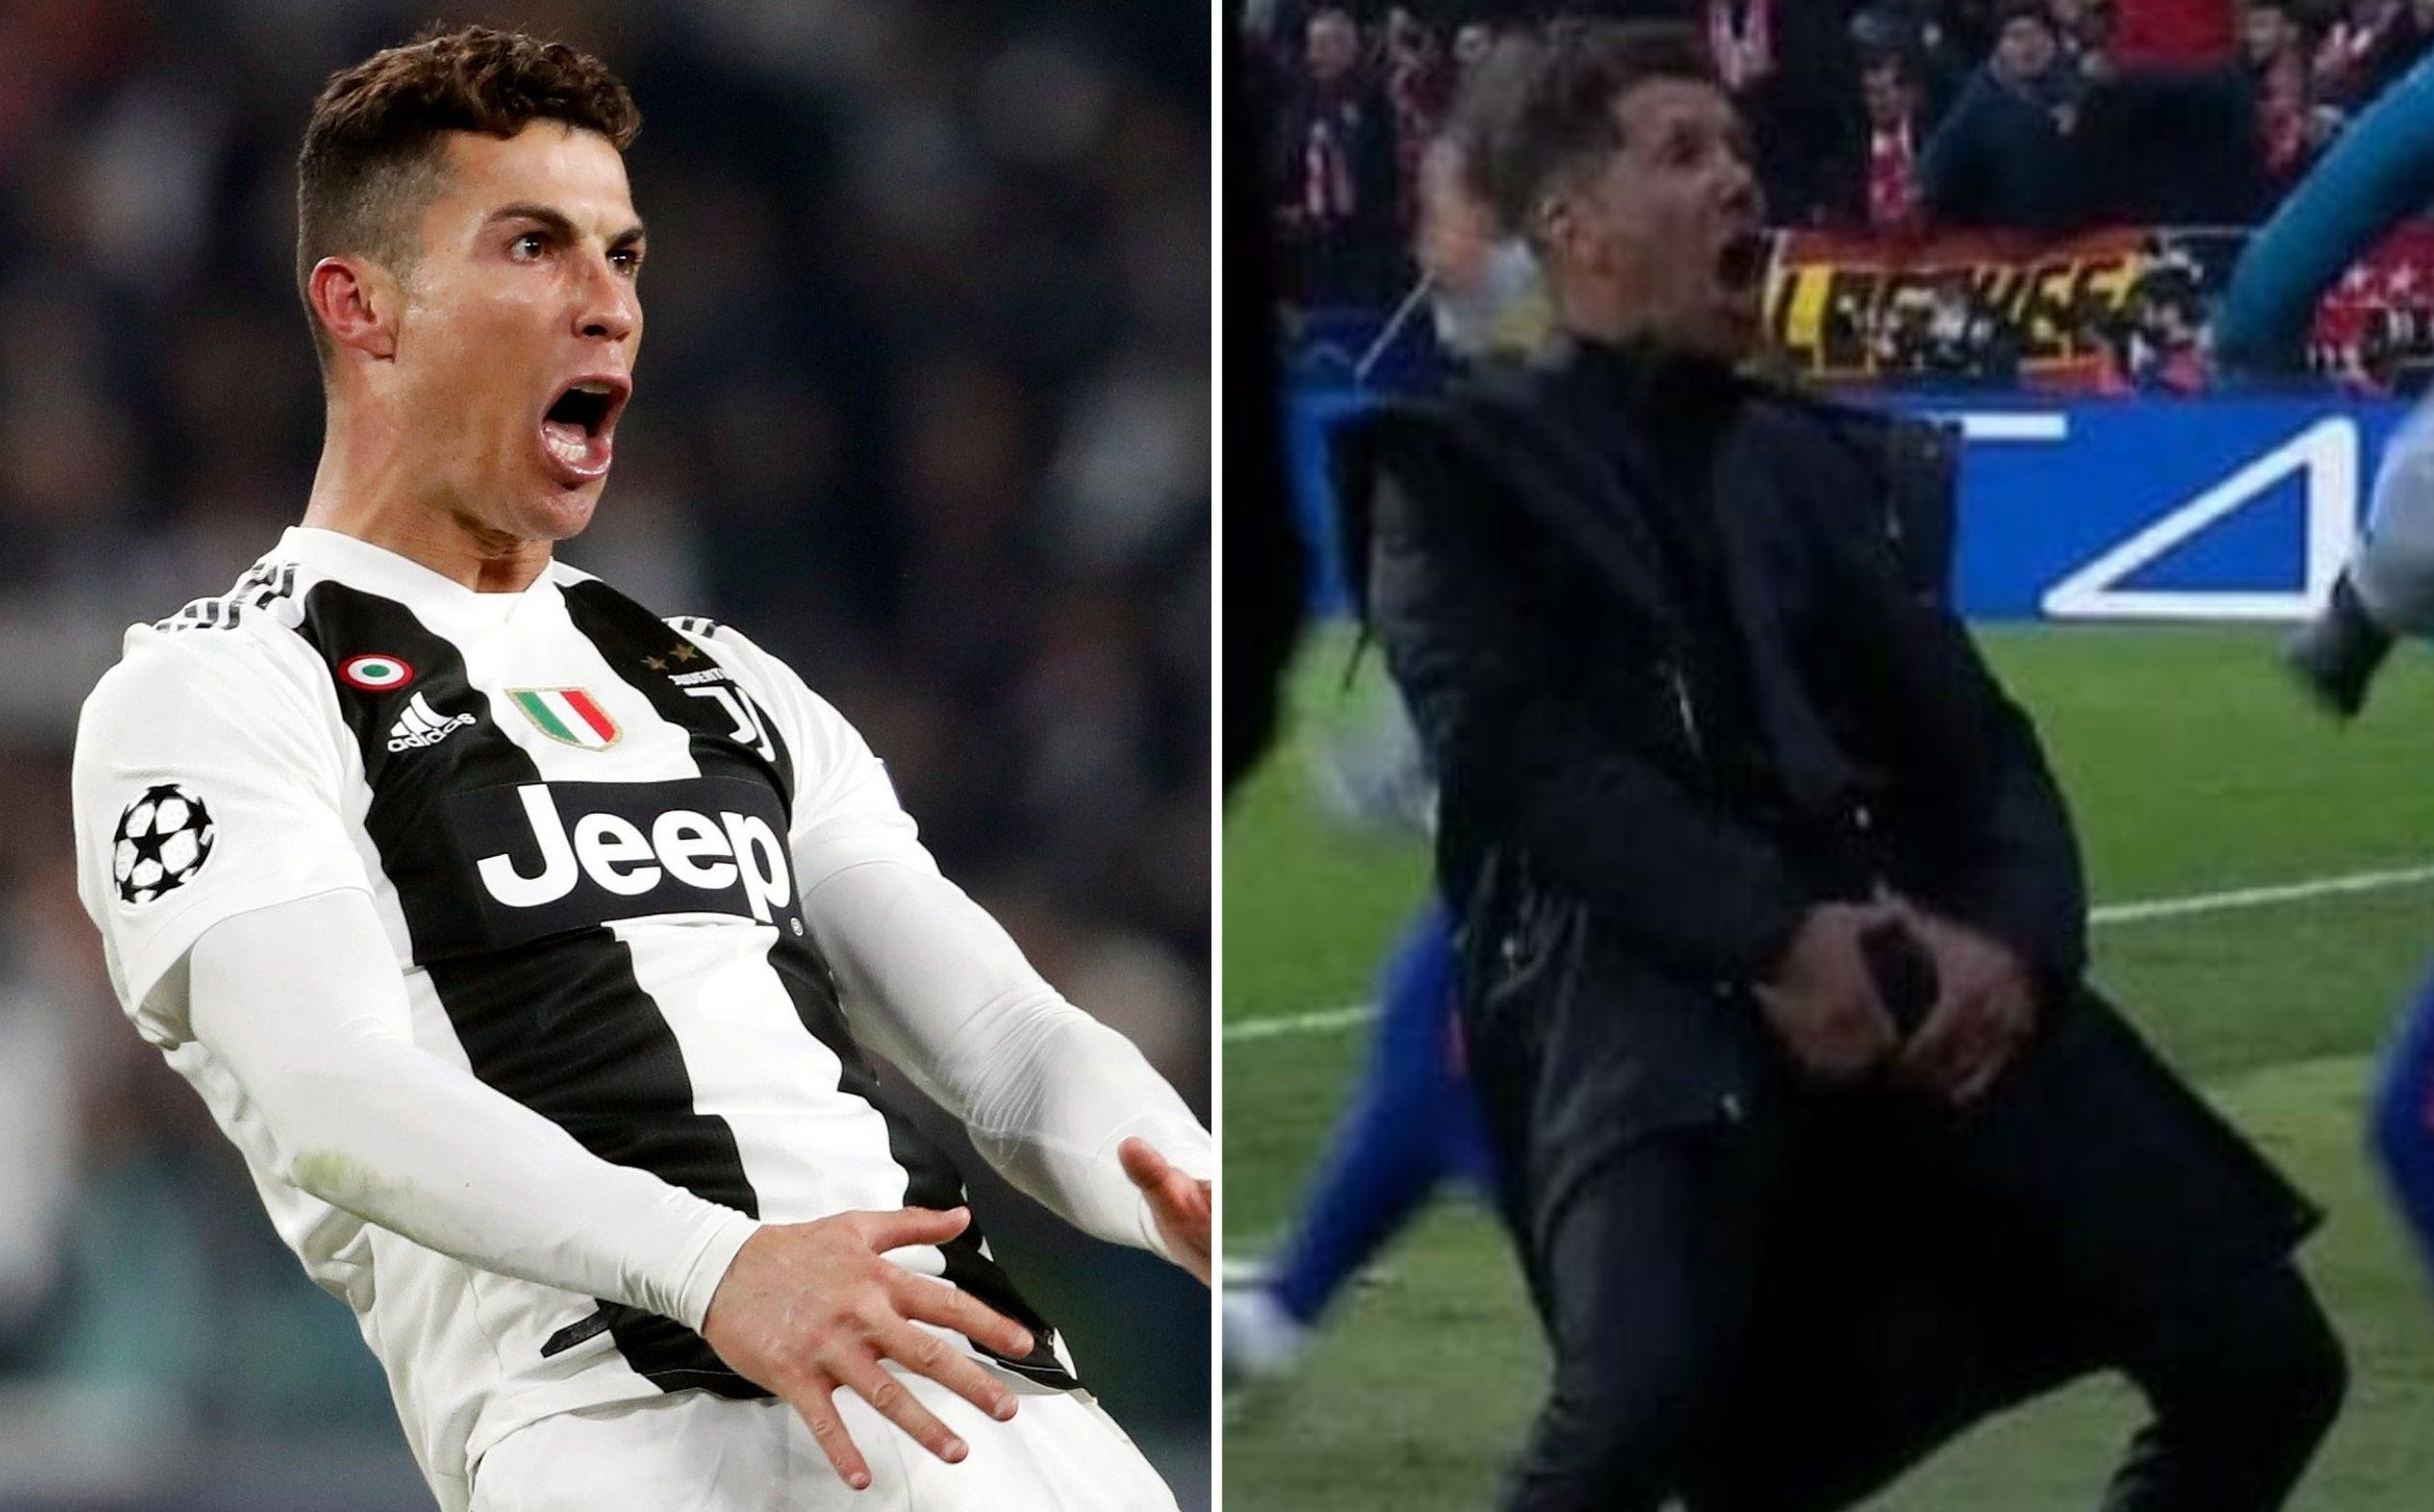 Diego Simeone responds to Cristiano Ronaldo copying his celebration after Juventus beat Atletico Madrid